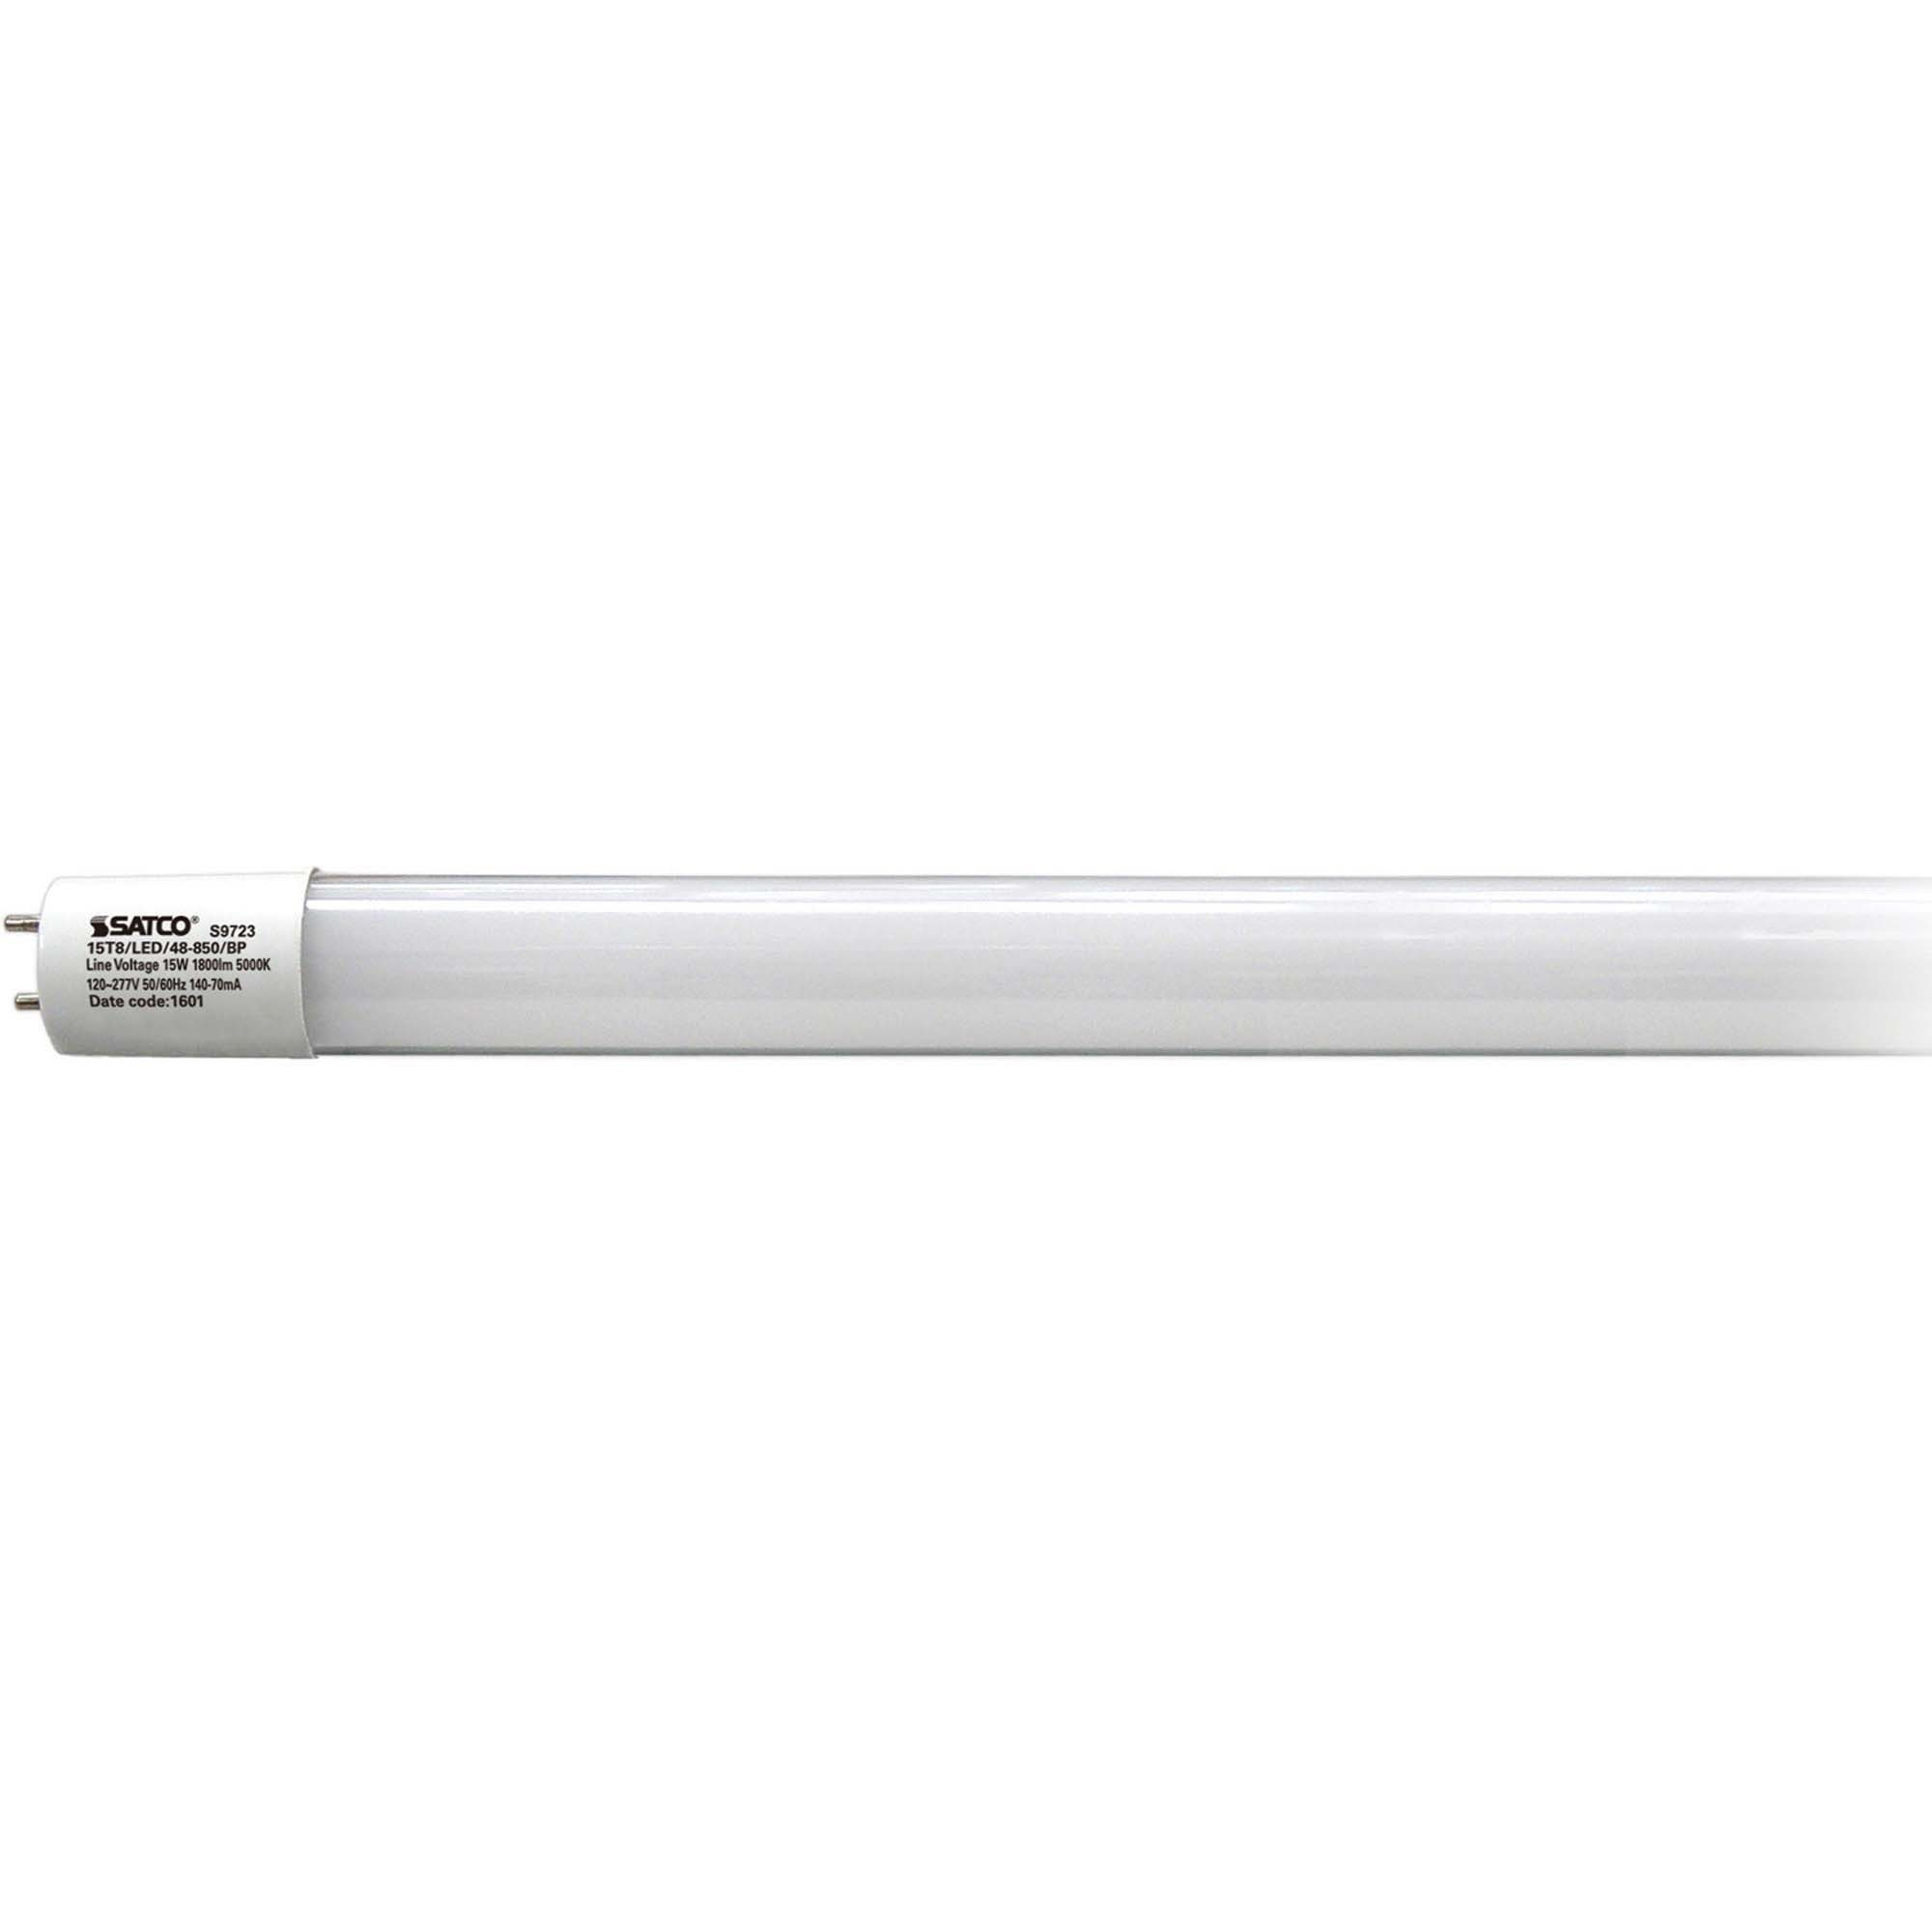 Satco T8 LED Tube Cool White 1800 Lumens - 15 W - 110 V AC - 1800 lm - Tubular - T8 Size - Cool White Light Color - 50000 Hour - 82 CRI - 10 / Carton  sc 1 st  Power Surge Technologies Ltd. & Power Surge Technologies Ltd. :: Furniture :: Office Decor ...